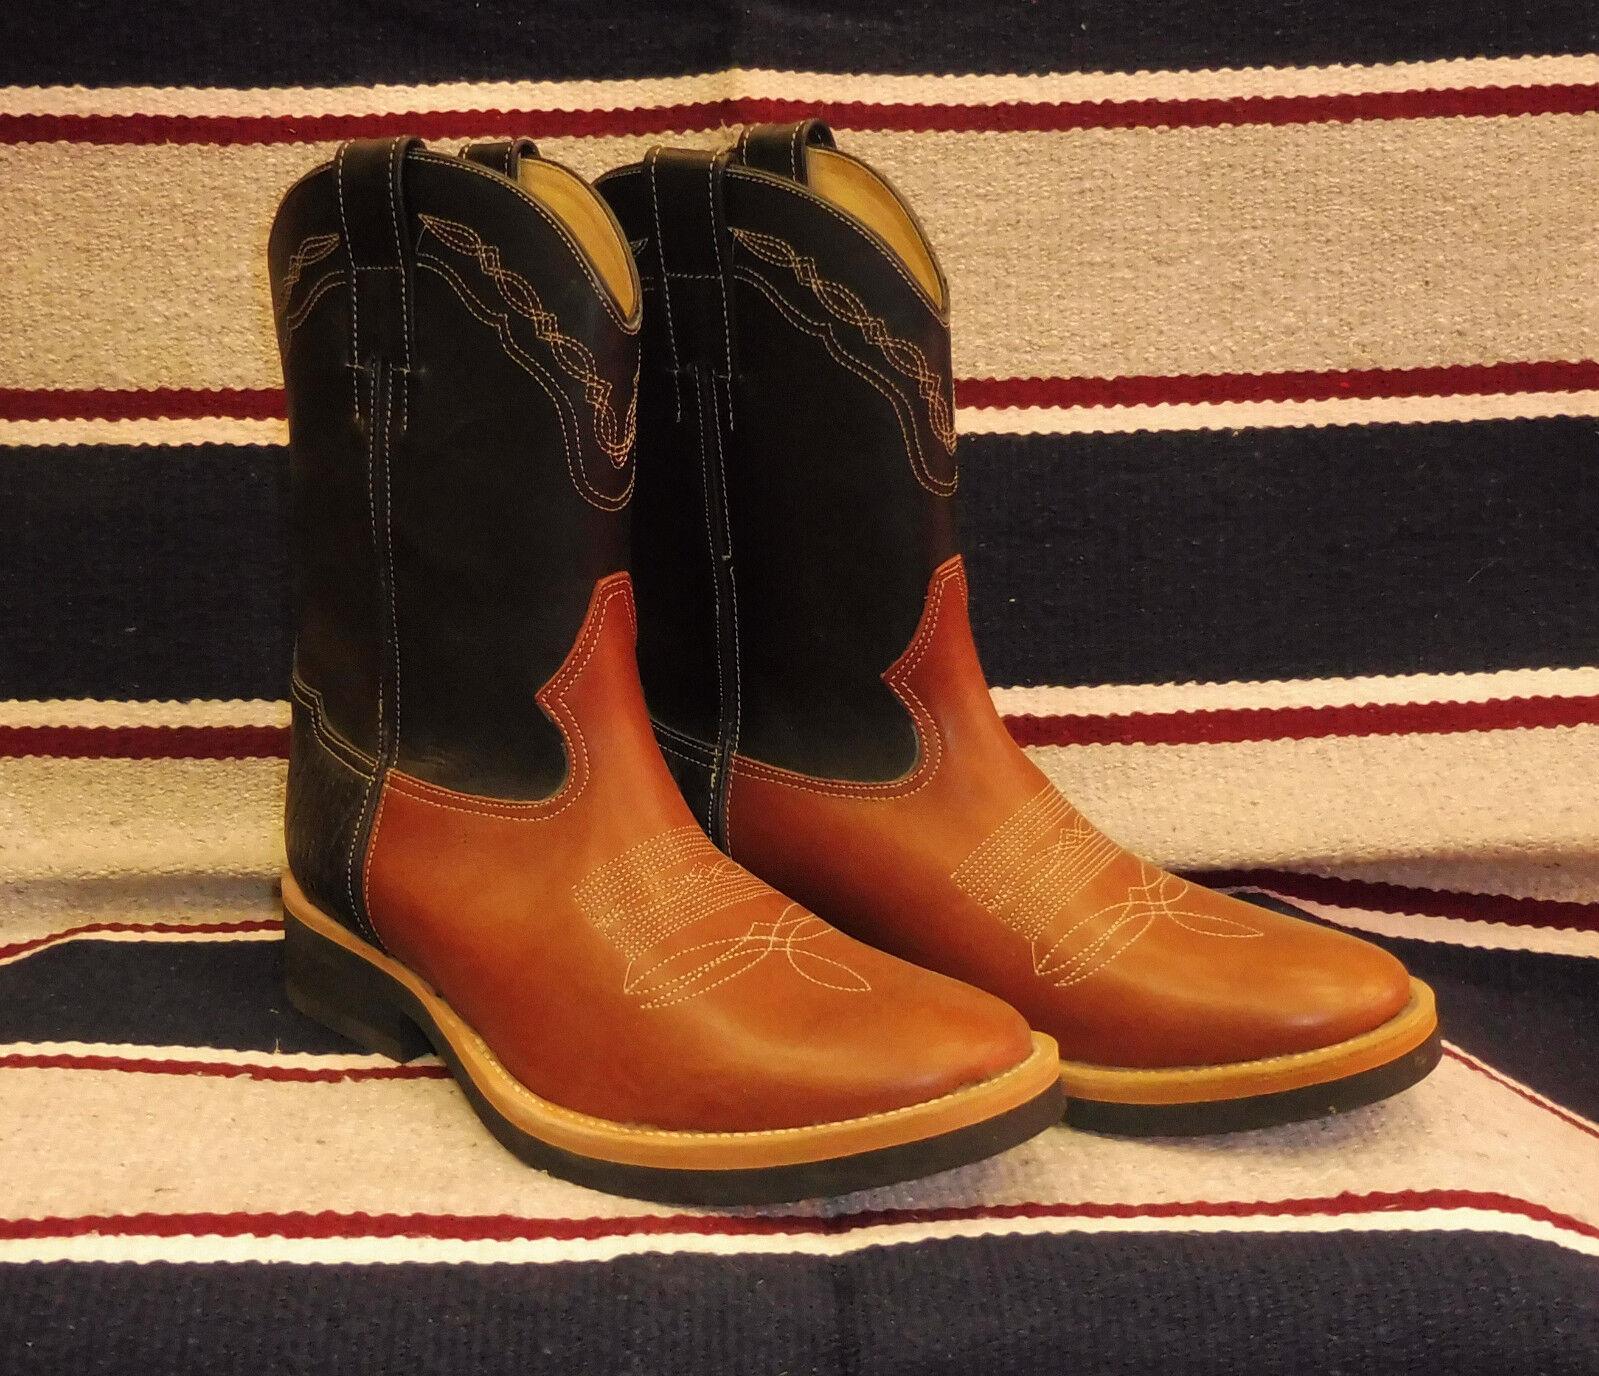 620 Stivali stivale roper texani country western cowboy BARKLEY microcrepe 43